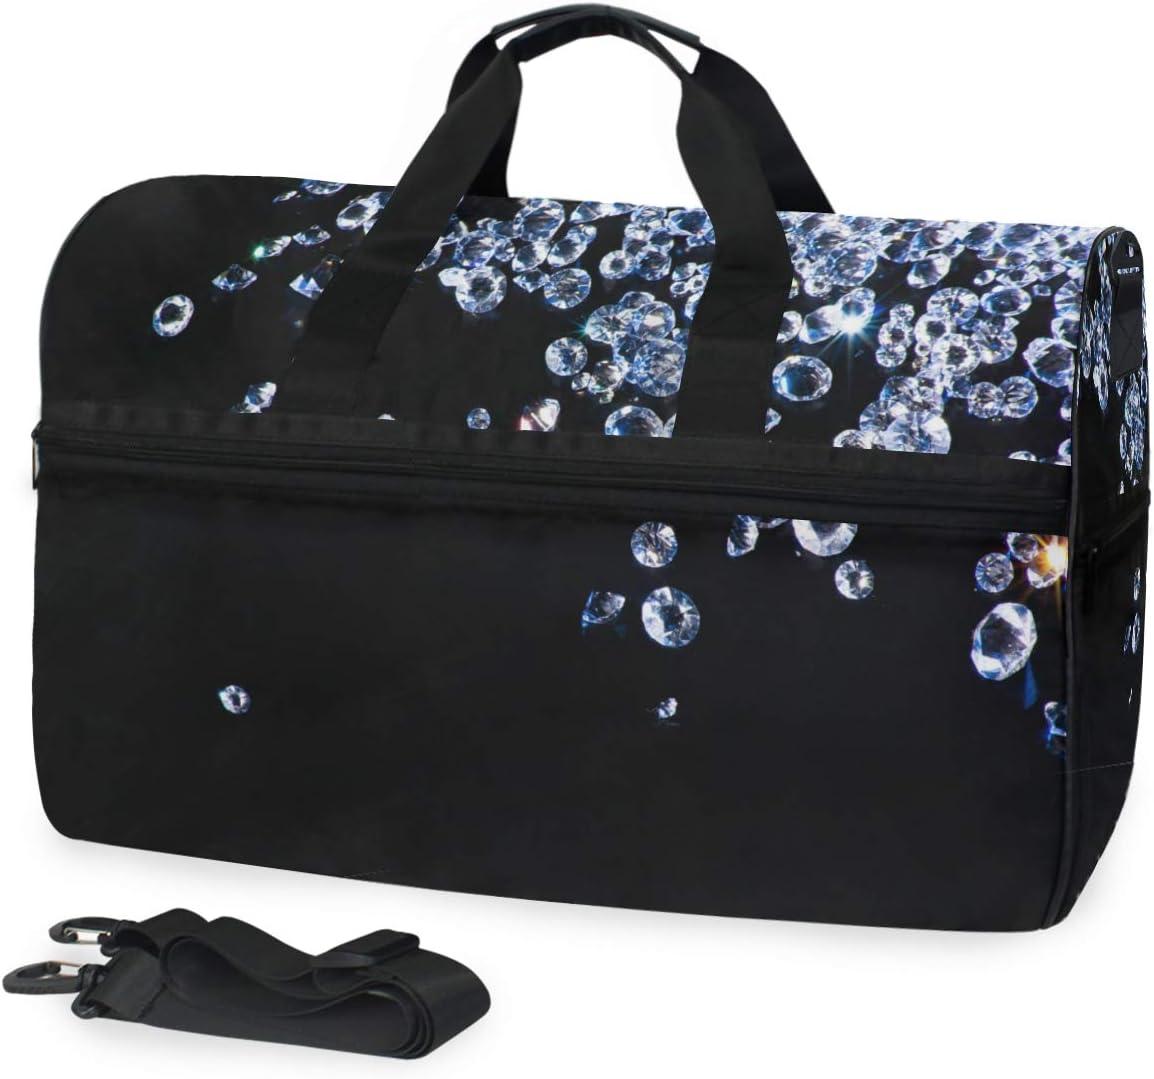 FAJRO Duffle Bag for Women Men Shinning Diamond Travel Duffel Bag Large Size Water-proof Tear Resistant